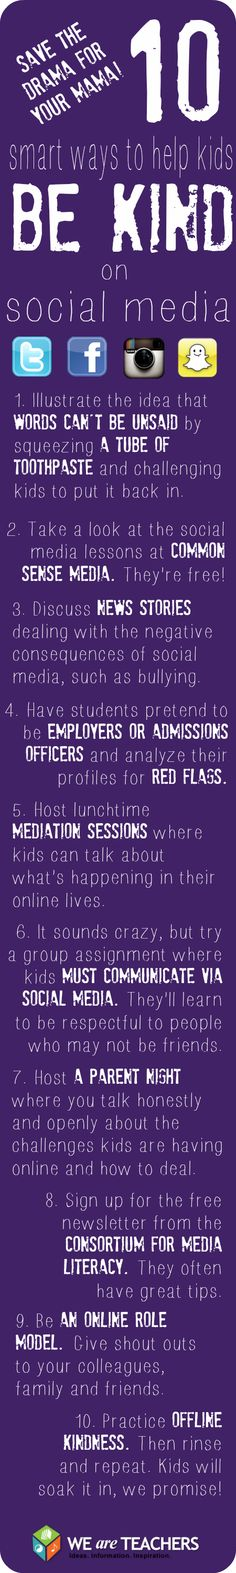 Teaching Social Media Skills onderwijs Teacher Helpline: How Can I Teach Kids to Be Nice Online? Middle School Counseling, School Counselor, Social Media Etiquette, We Are Teachers, Web 2.0, Bullying Prevention, Digital Literacy, Media Literacy, Digital Citizenship